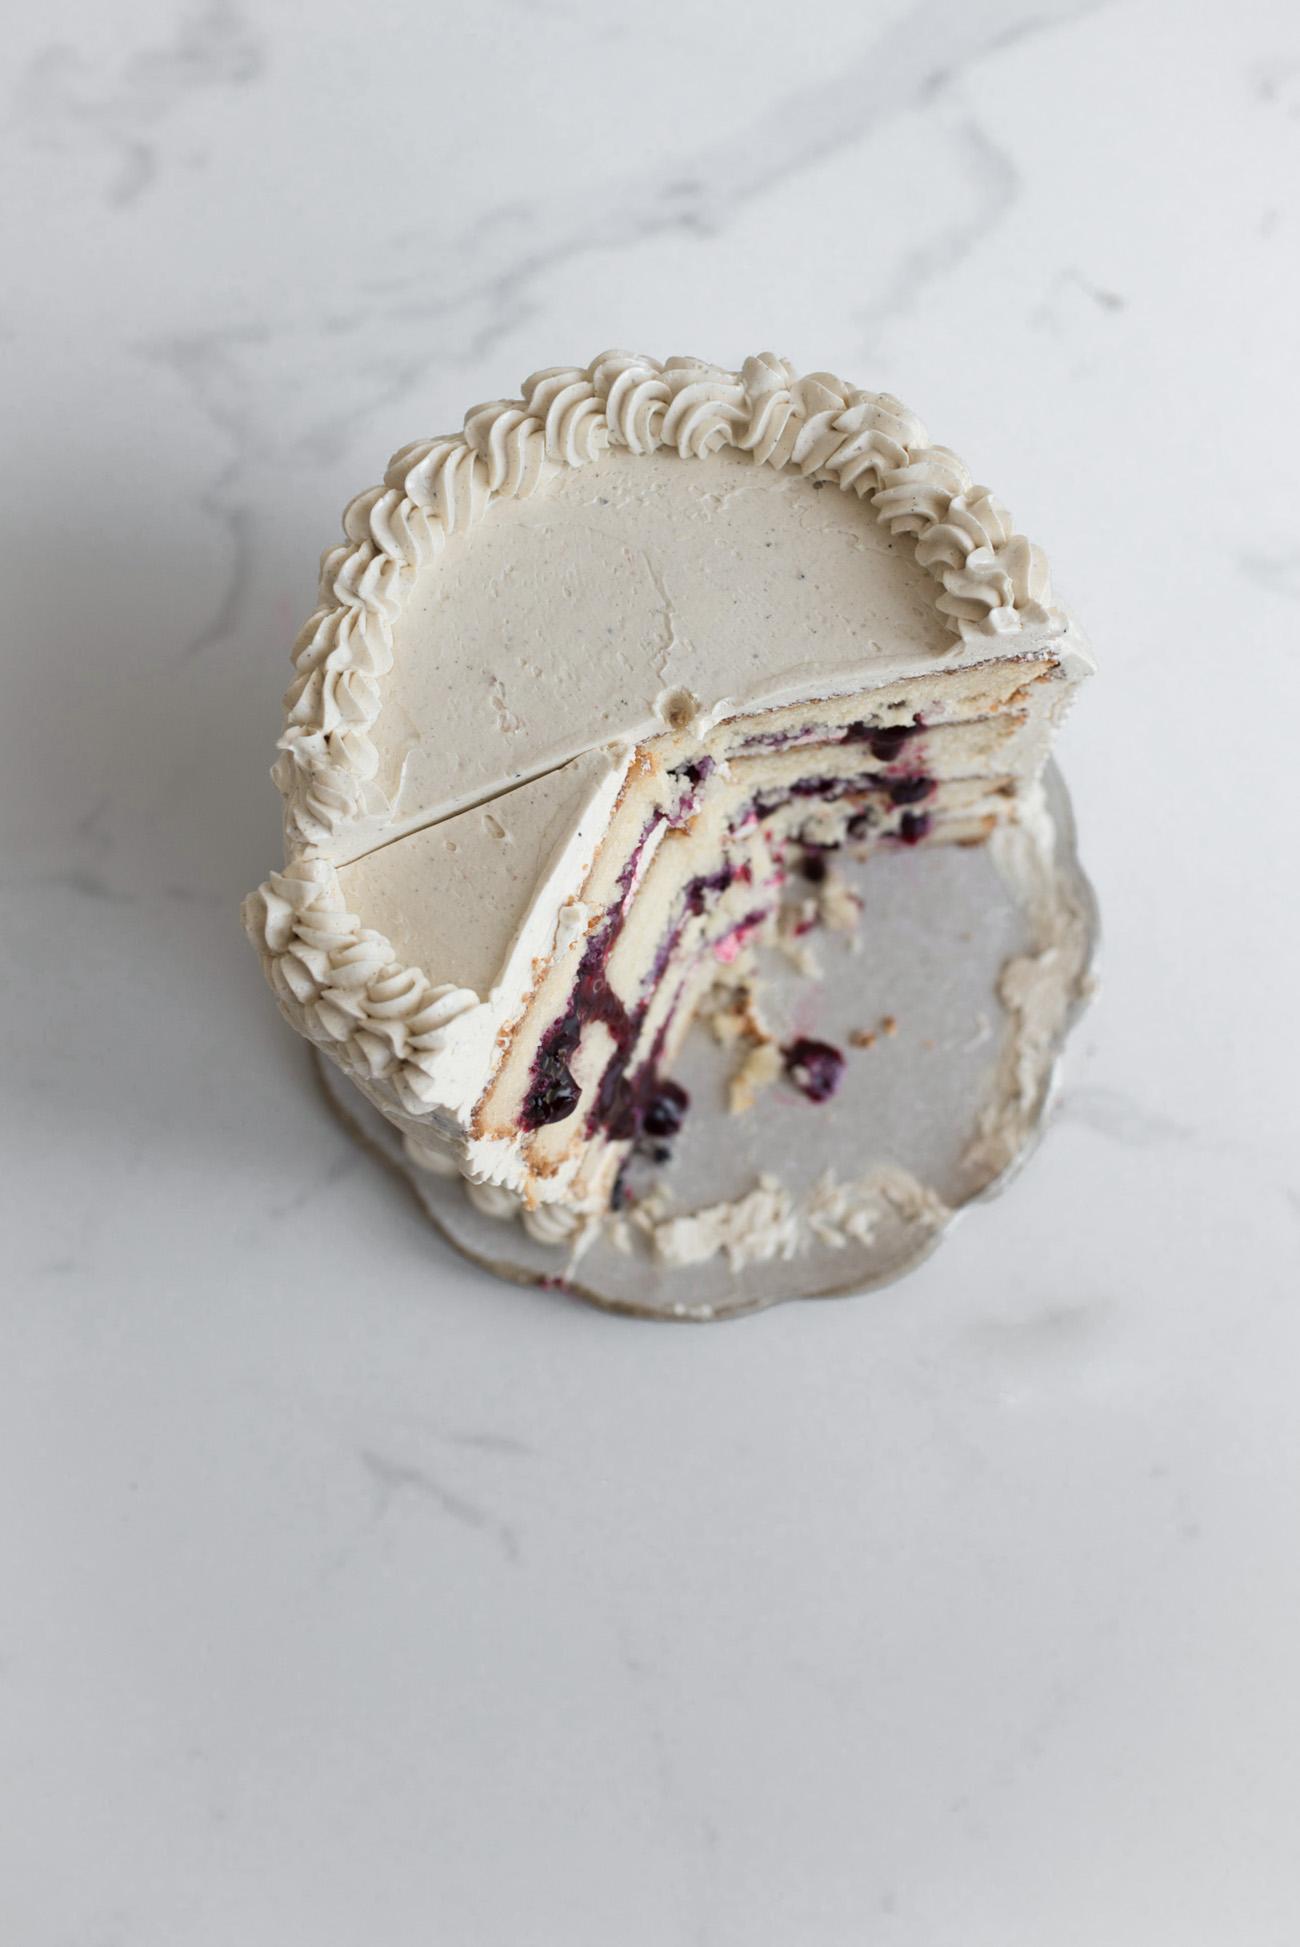 Marzipan-Cake-48-of-100.jpg